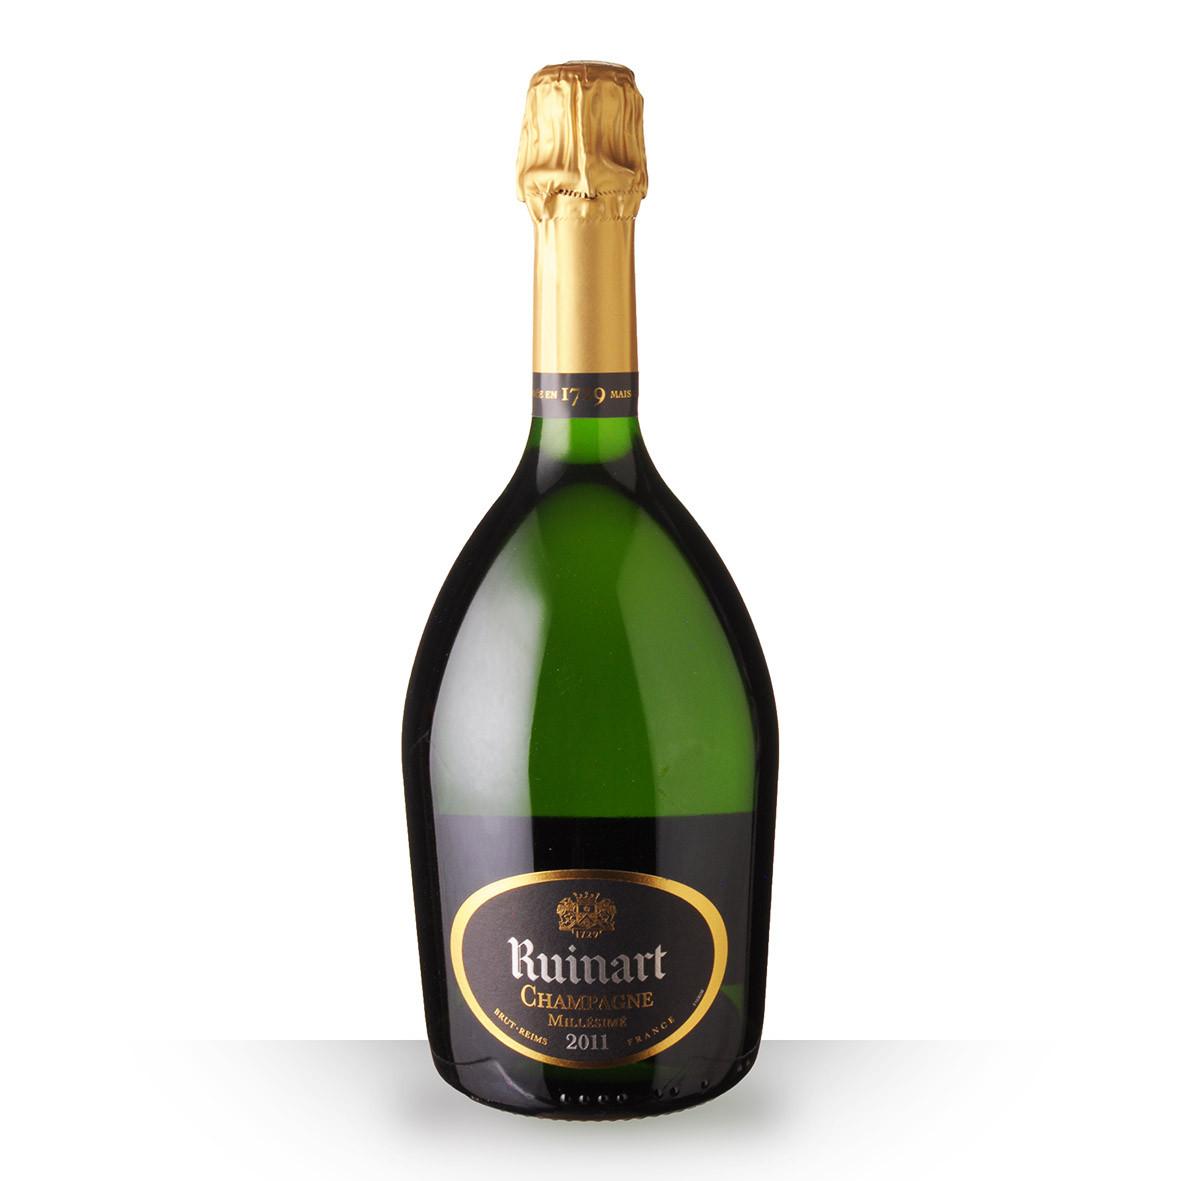 Champagne Ruinart Brut Millésimé 2011 75cl www.odyssee-vins.com